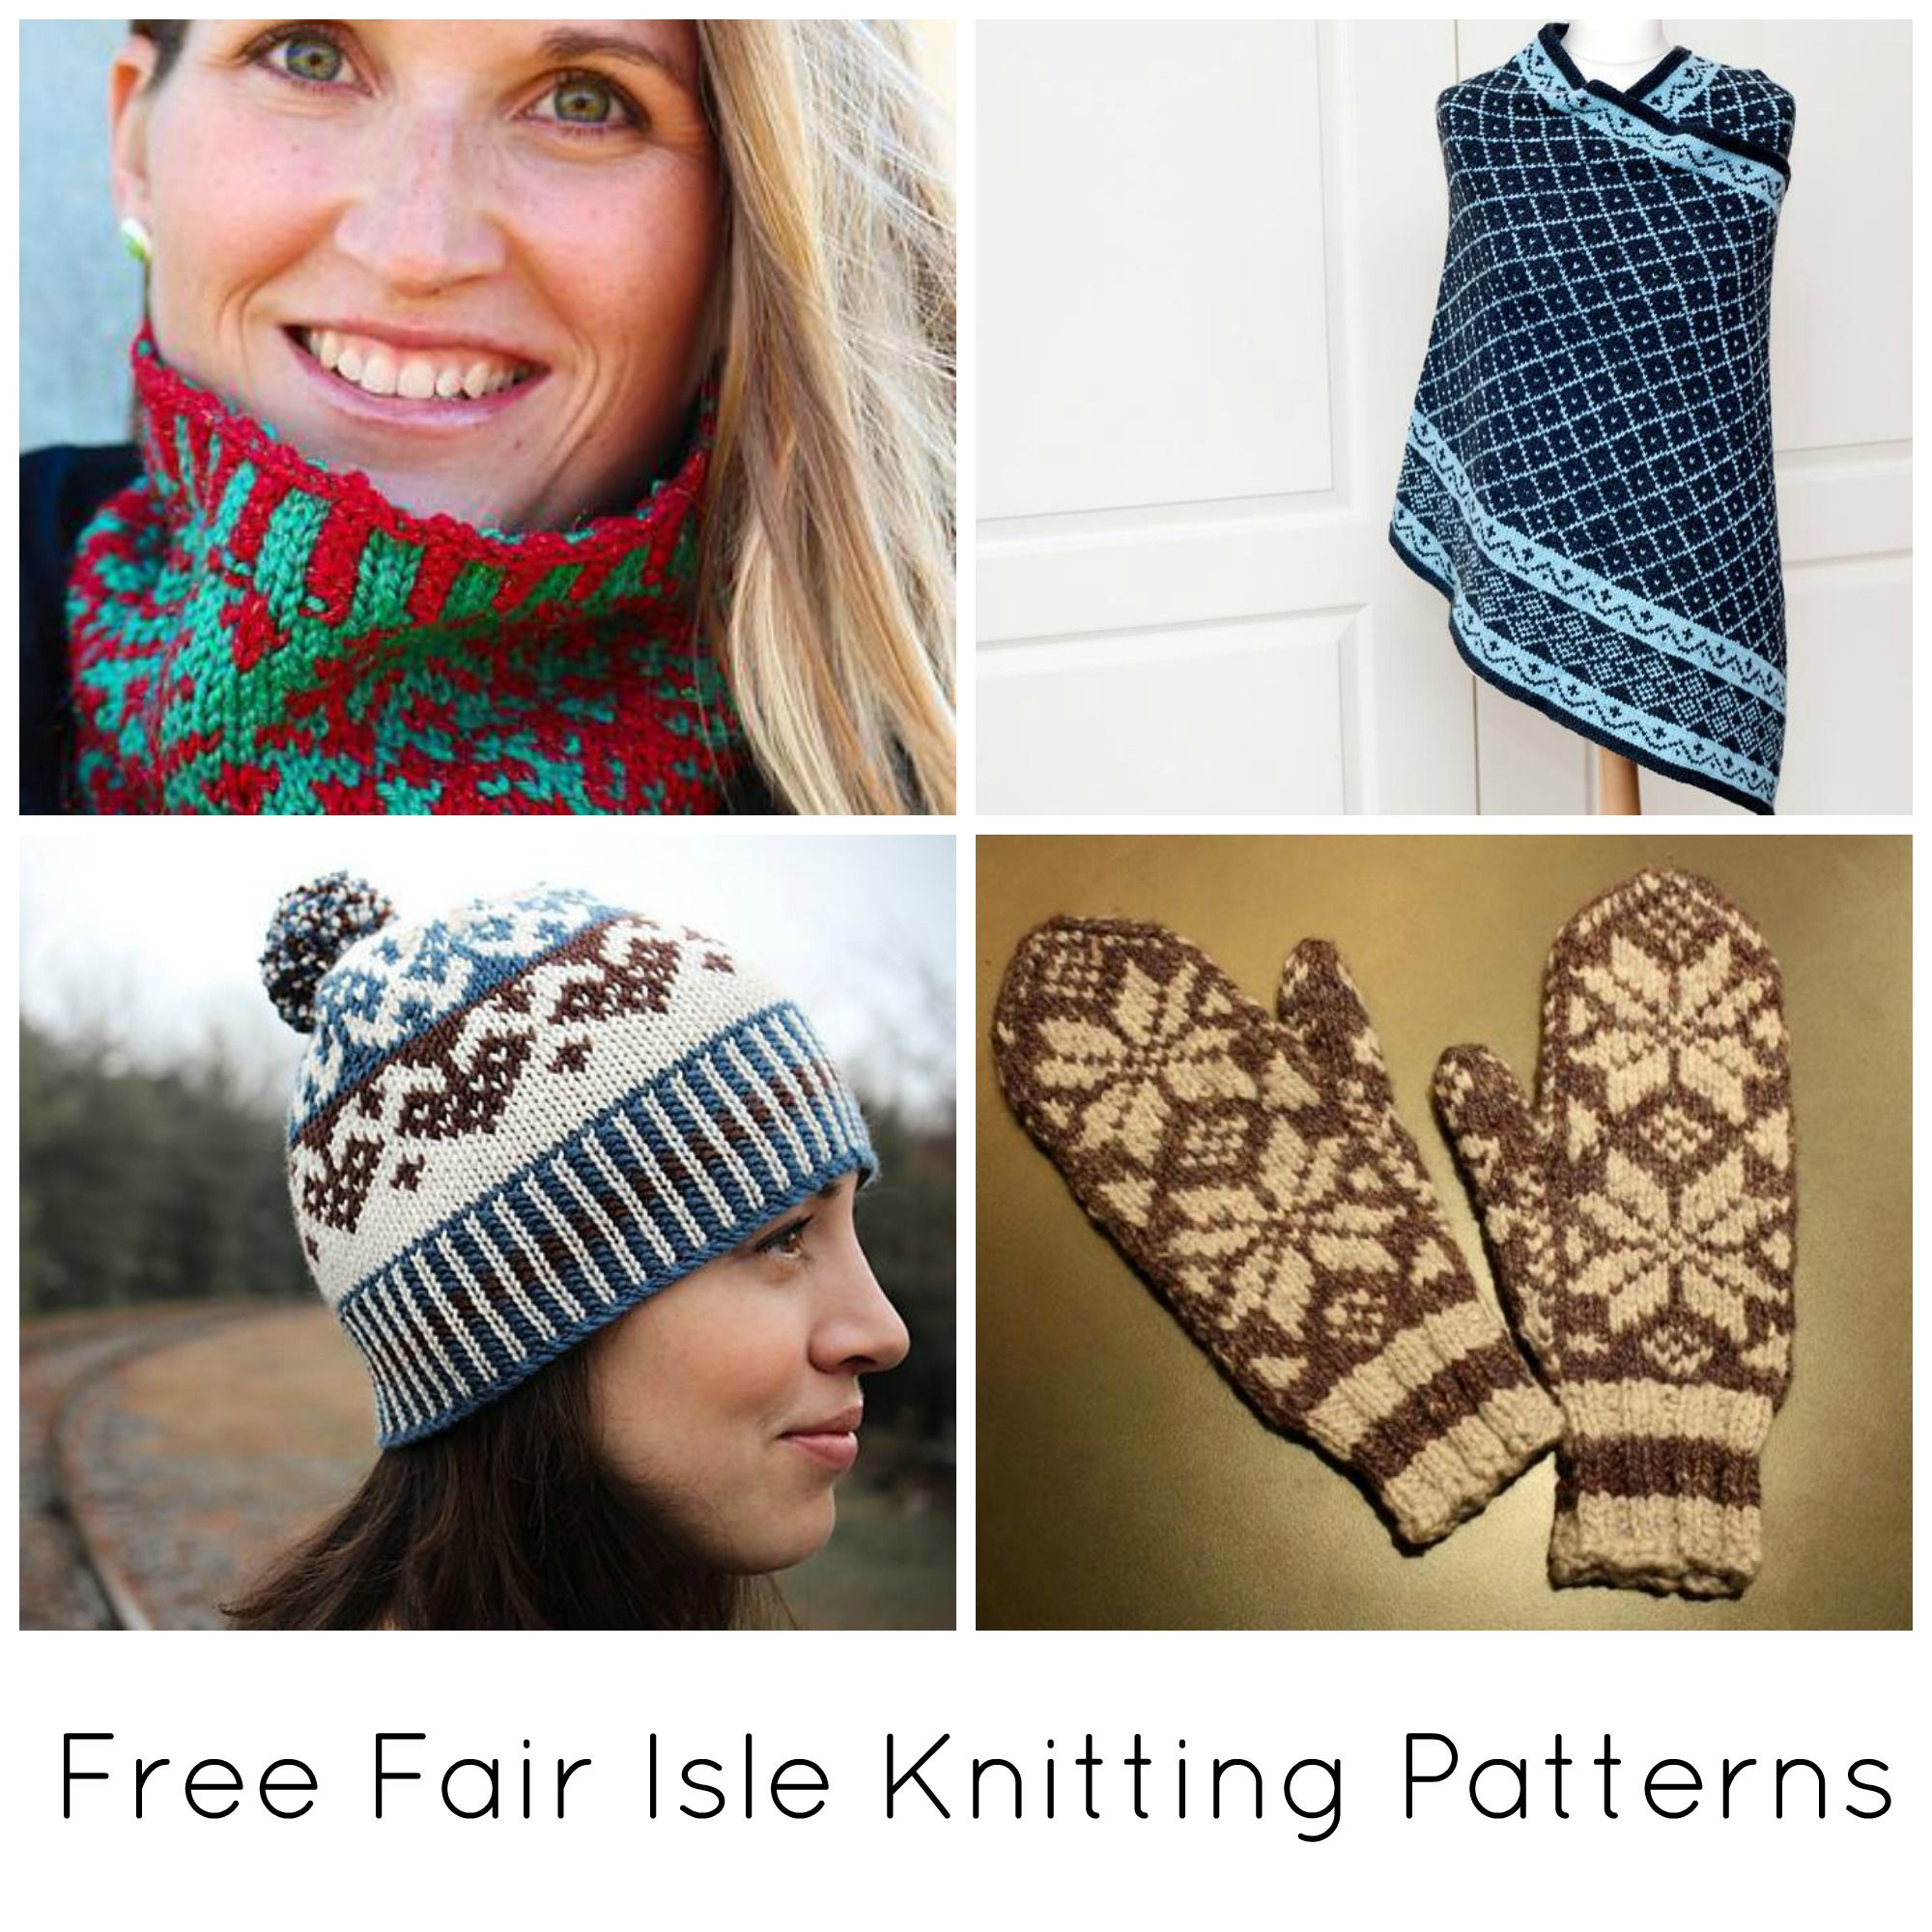 10 FREE Fair Isle Knitting Patterns on Craftsy   Pinterest ...